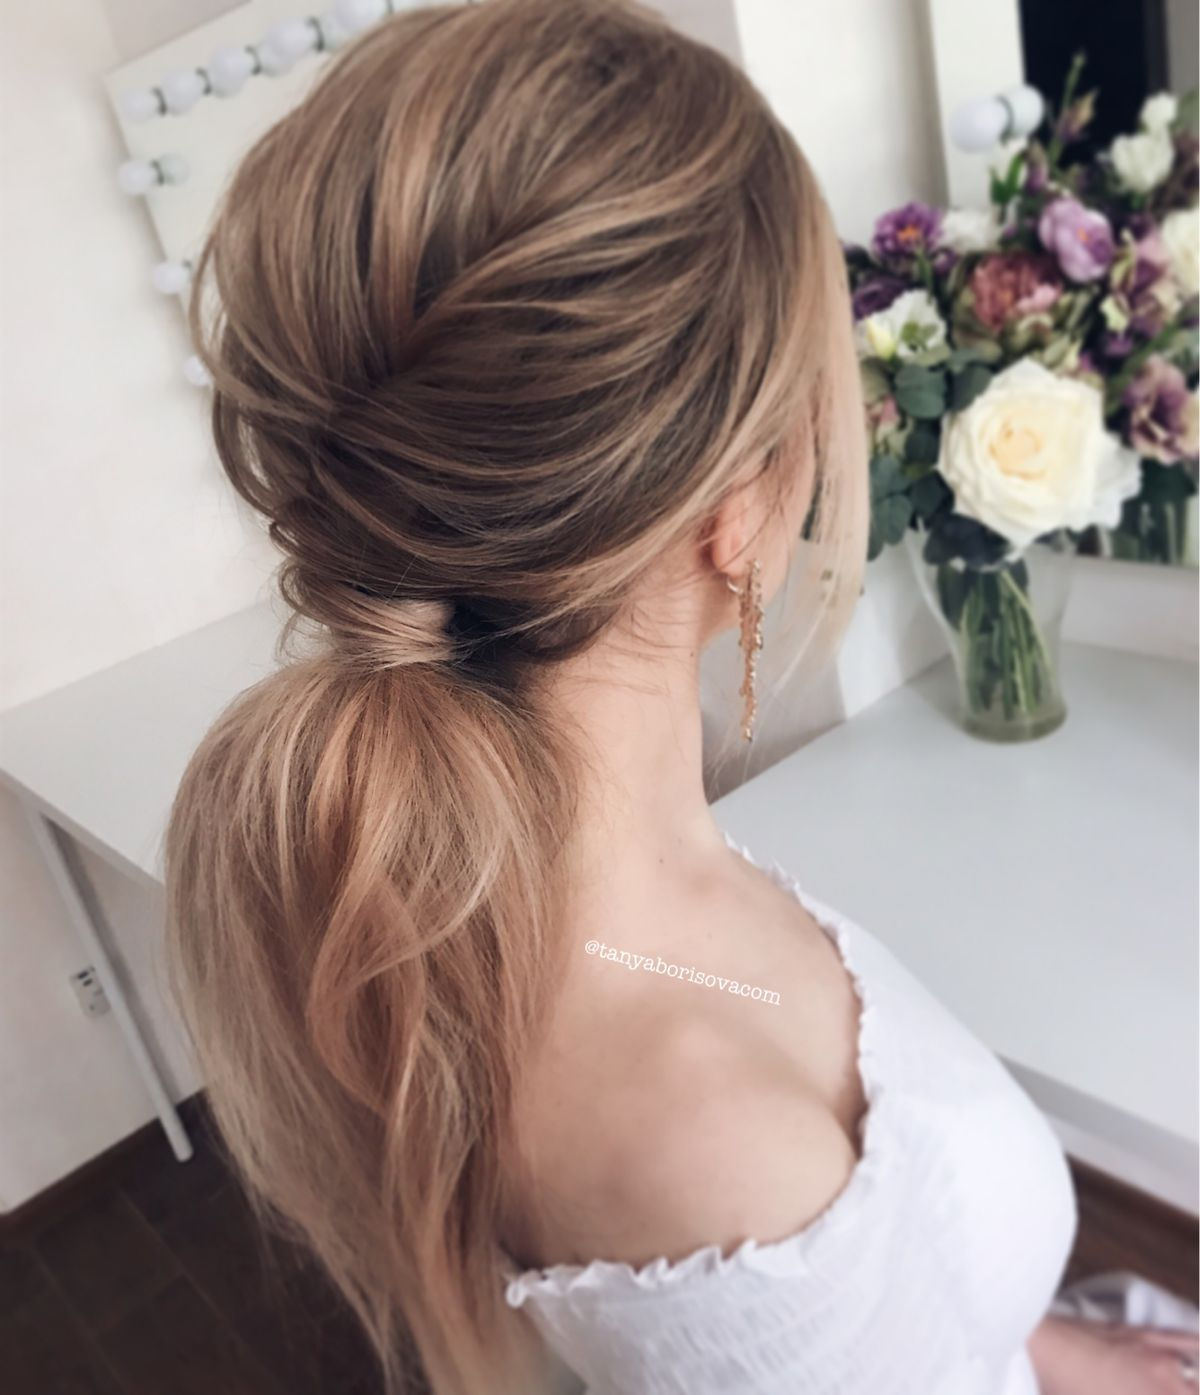 "Стильный и современный объёмный хвост. Stylish fashion ponytail for a long blond hair.<p><a href=""http://www.homeinteriordesign.org/2018/02/short-guide-to-interior-decoration.html"">Short guide to interior decoration</a></p>"